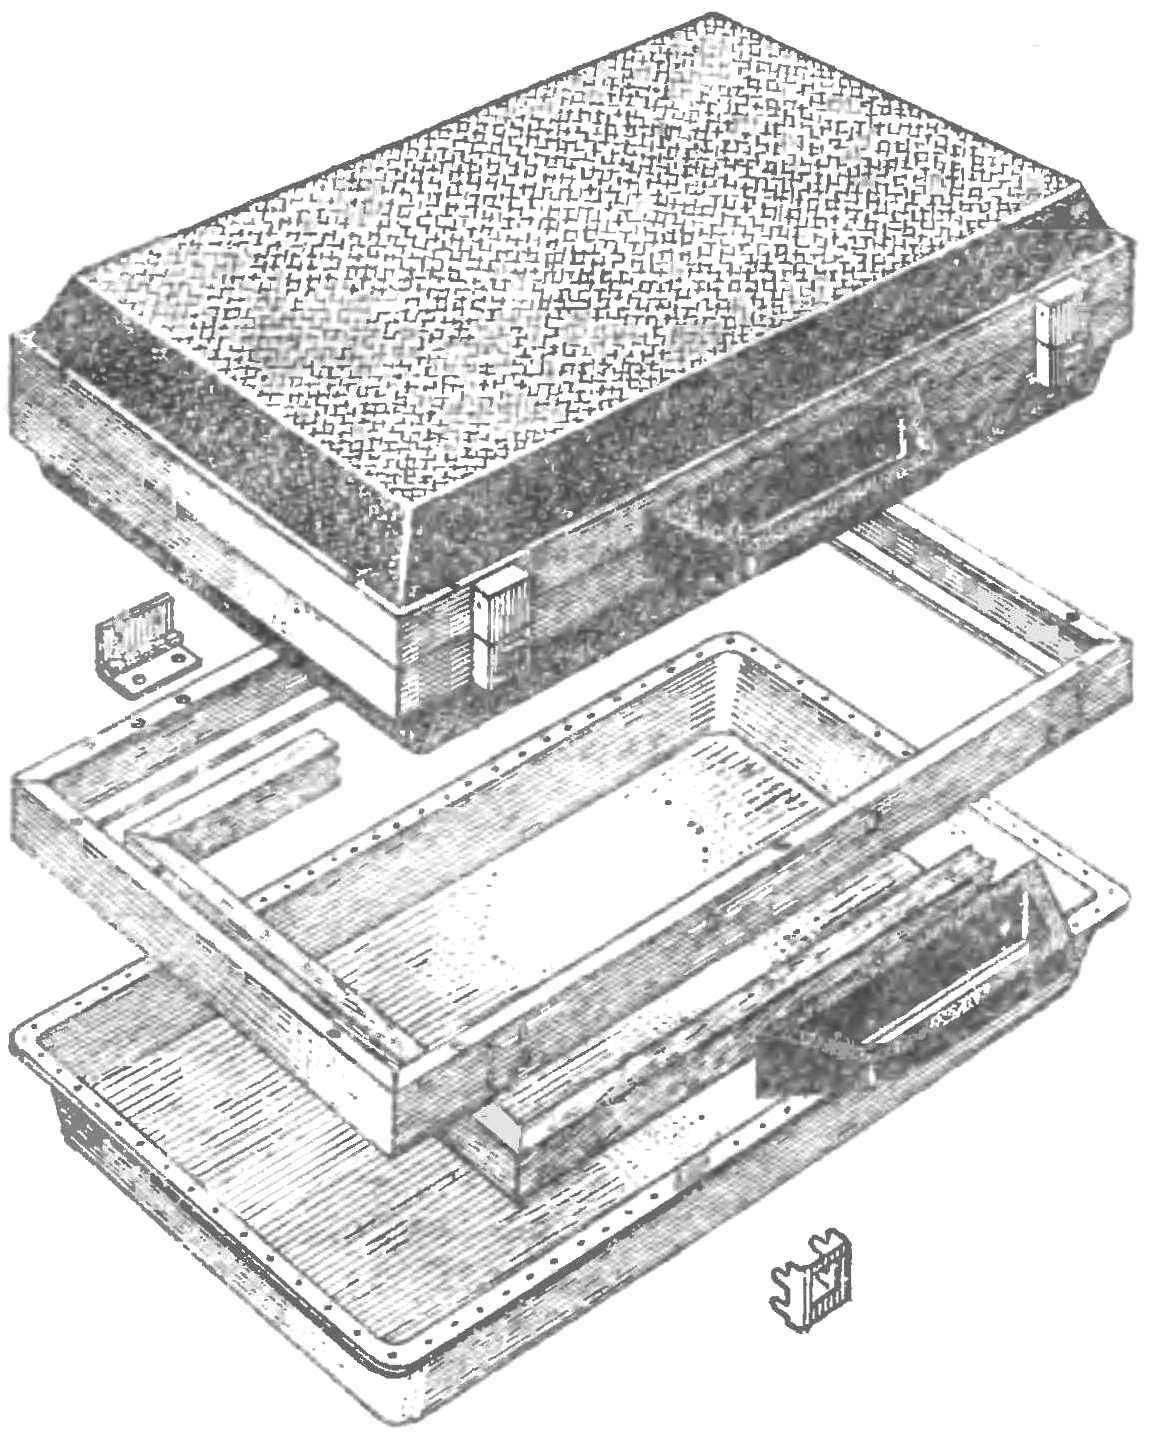 Рис. 4. Сборка полукорпуса кейса (облицовка не показана).